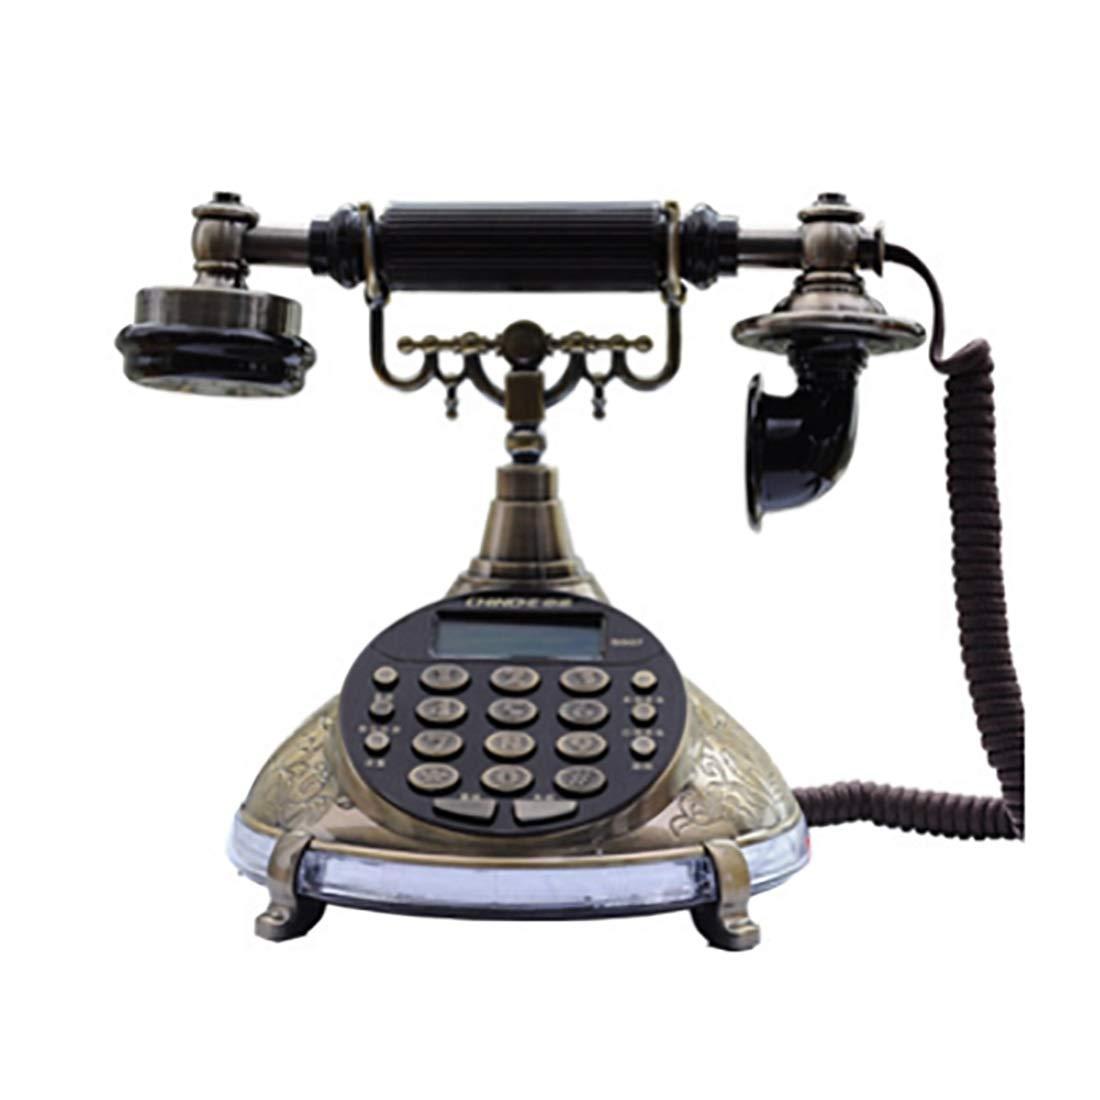 ZHILIAN Classic European Retro Home Phone Landline Fixed Telephone Bronze Fixed Button with Display